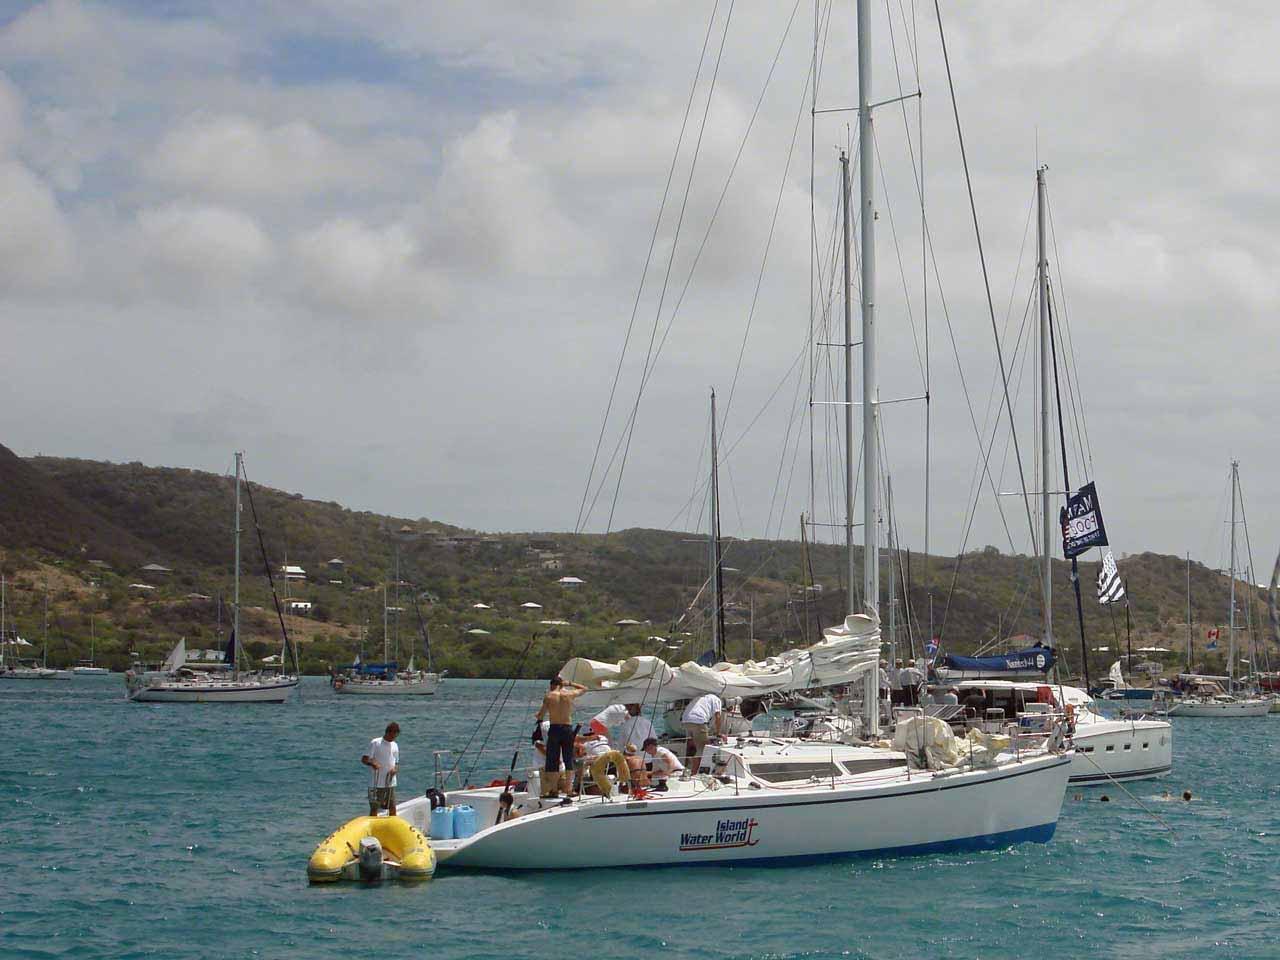 Antigua And Barbuda Country Page Pics Photos Bridge Parts Diagram Jobspapa Prepping A Race Week Boat